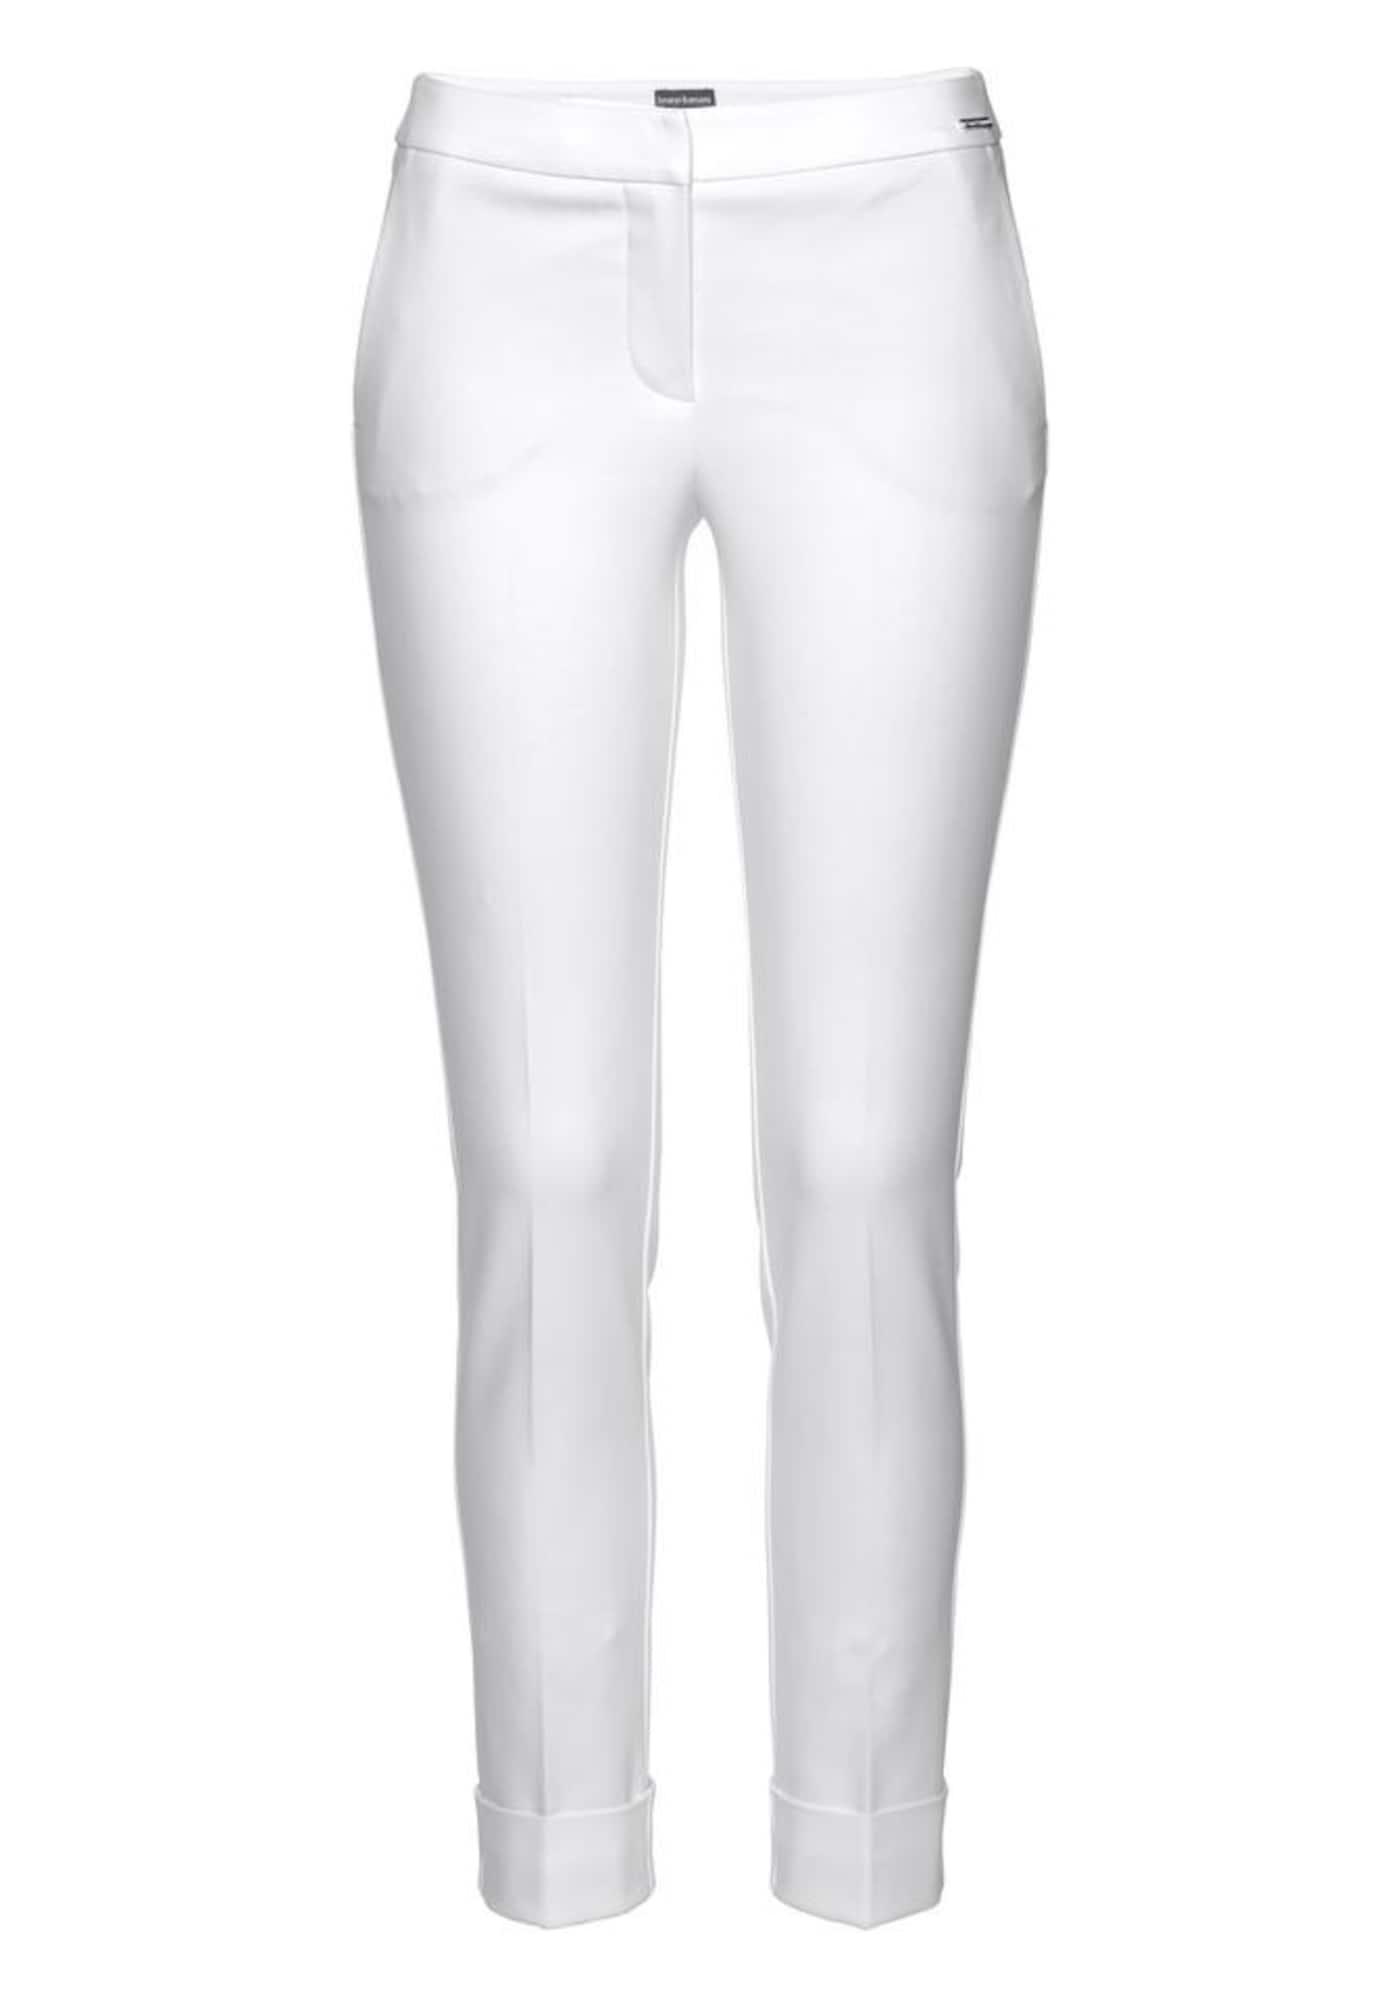 Bügelfaltenhose | Bekleidung > Hosen > Bügelfaltenhosen | Weiß | Bruno Banani